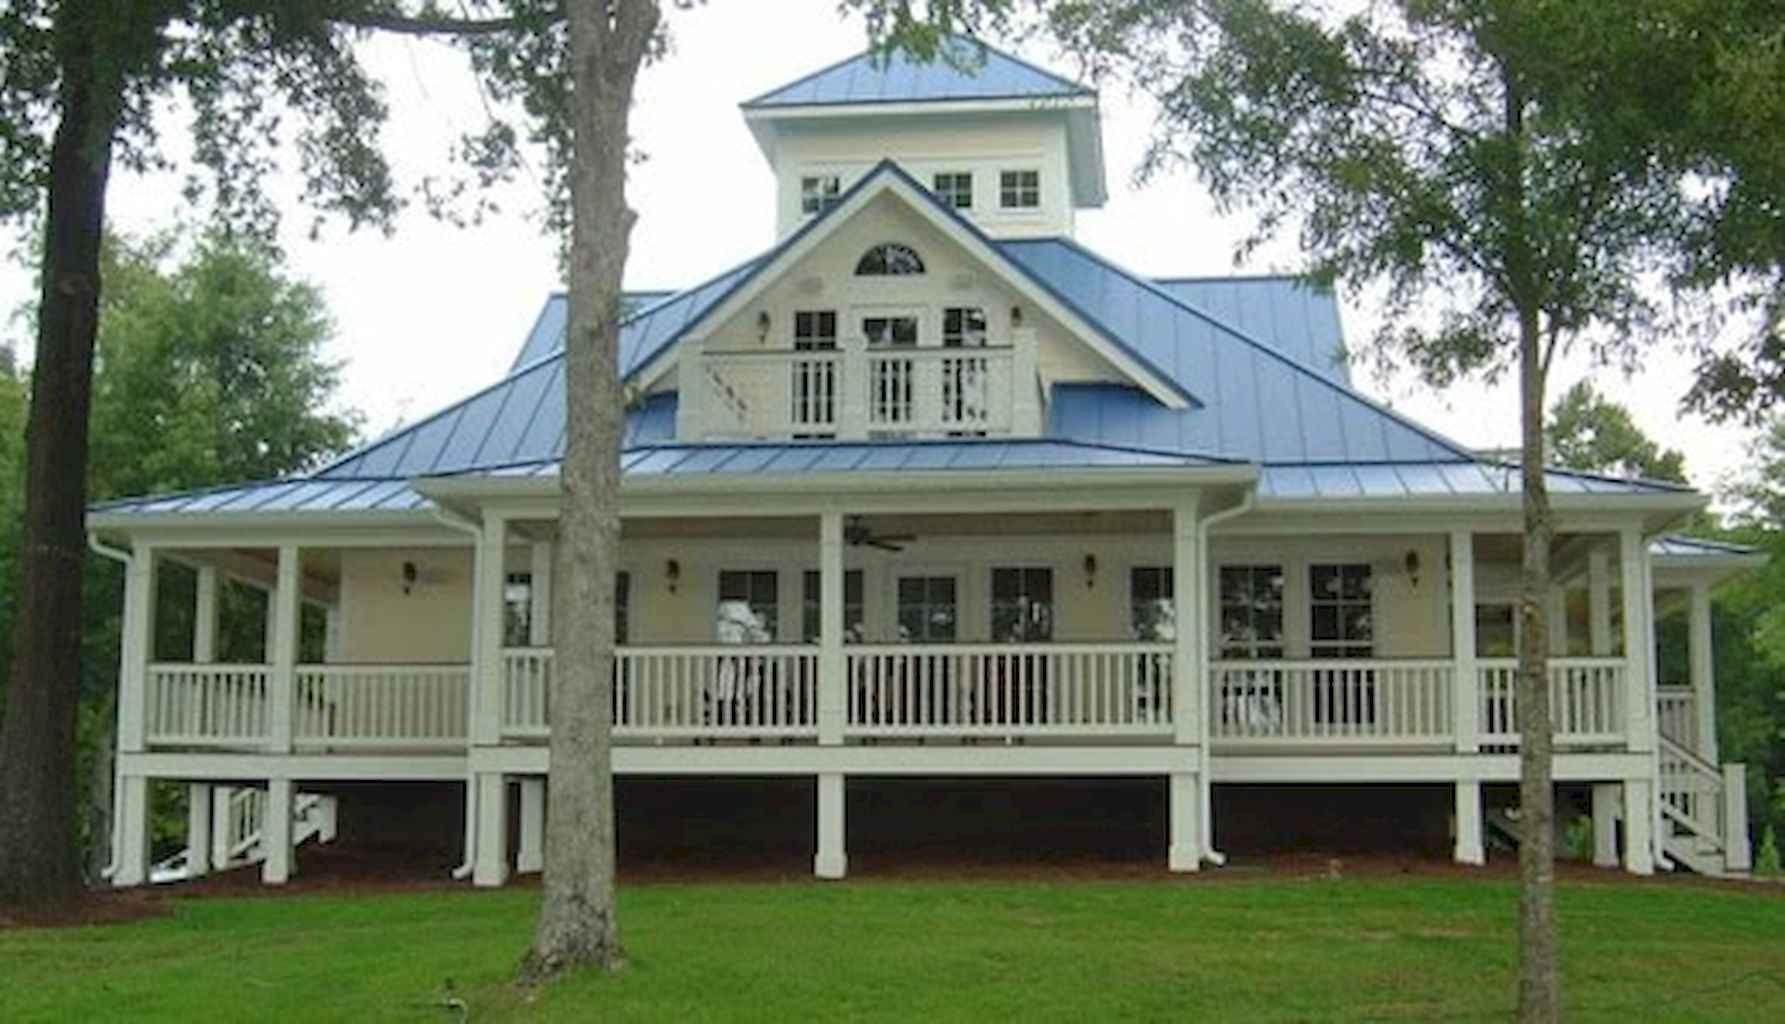 60 amazing farmhouse plans cracker style design ideas (27)